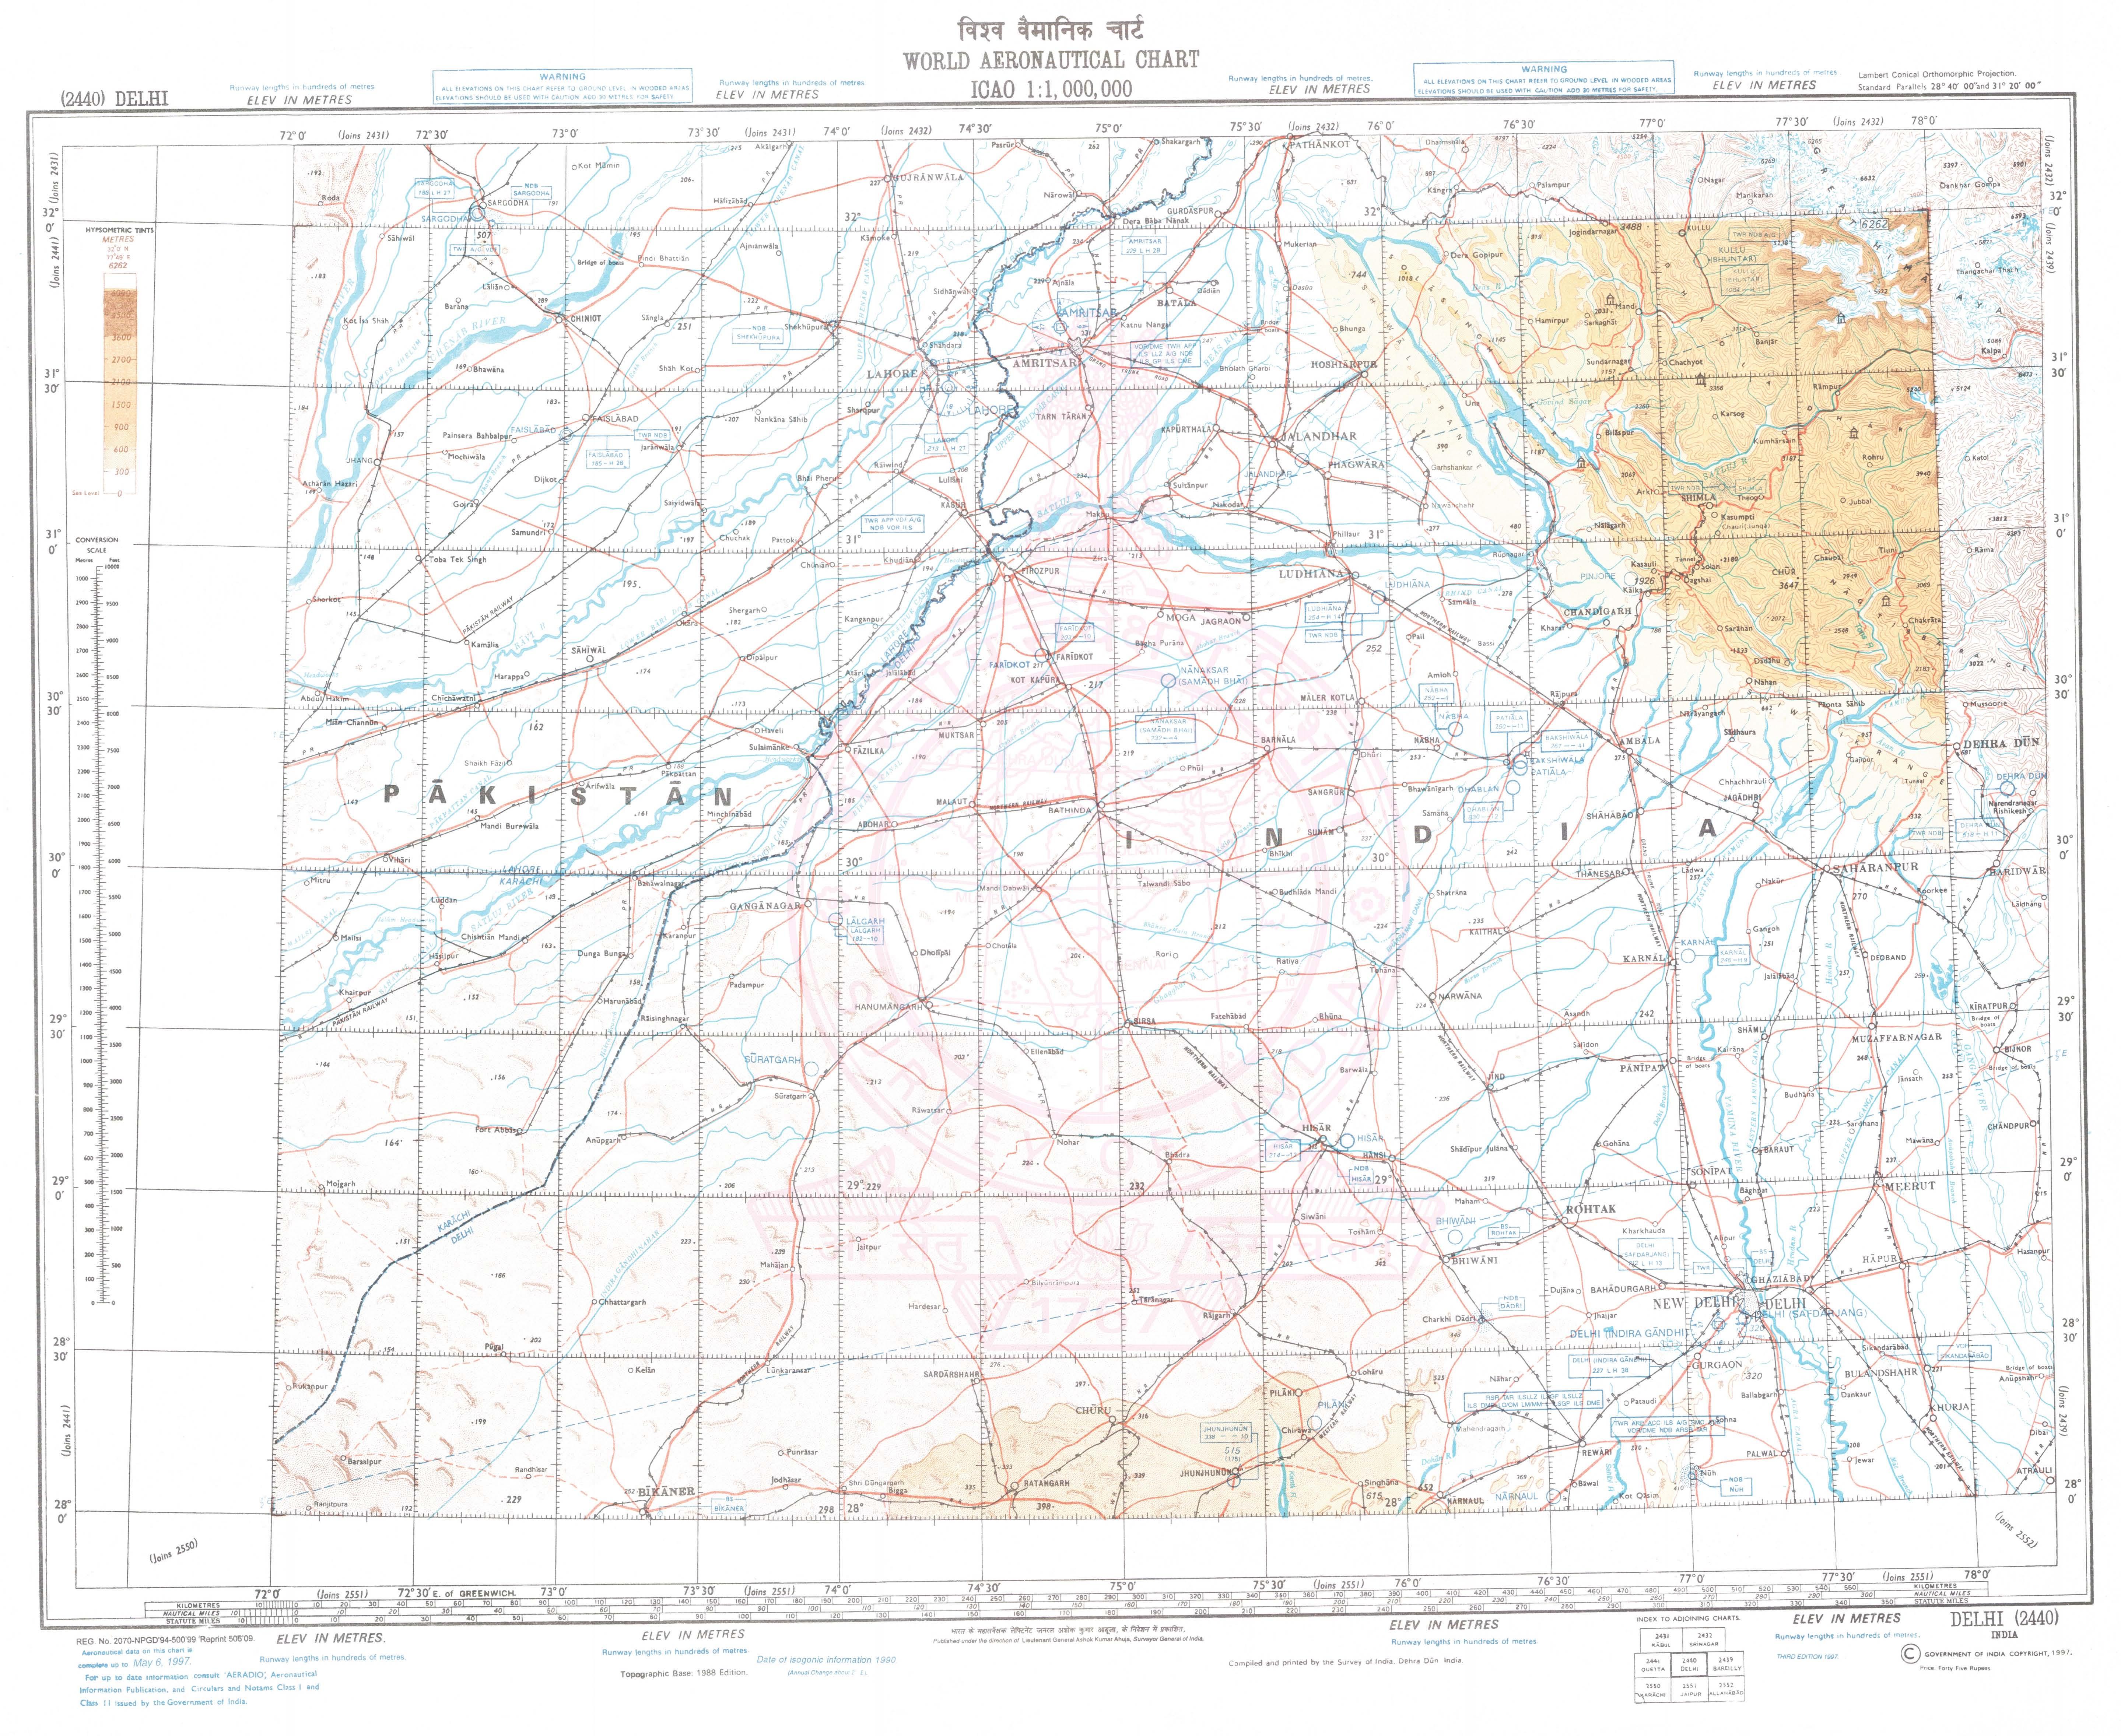 Aeronautical Charts and Maps: Survey of India